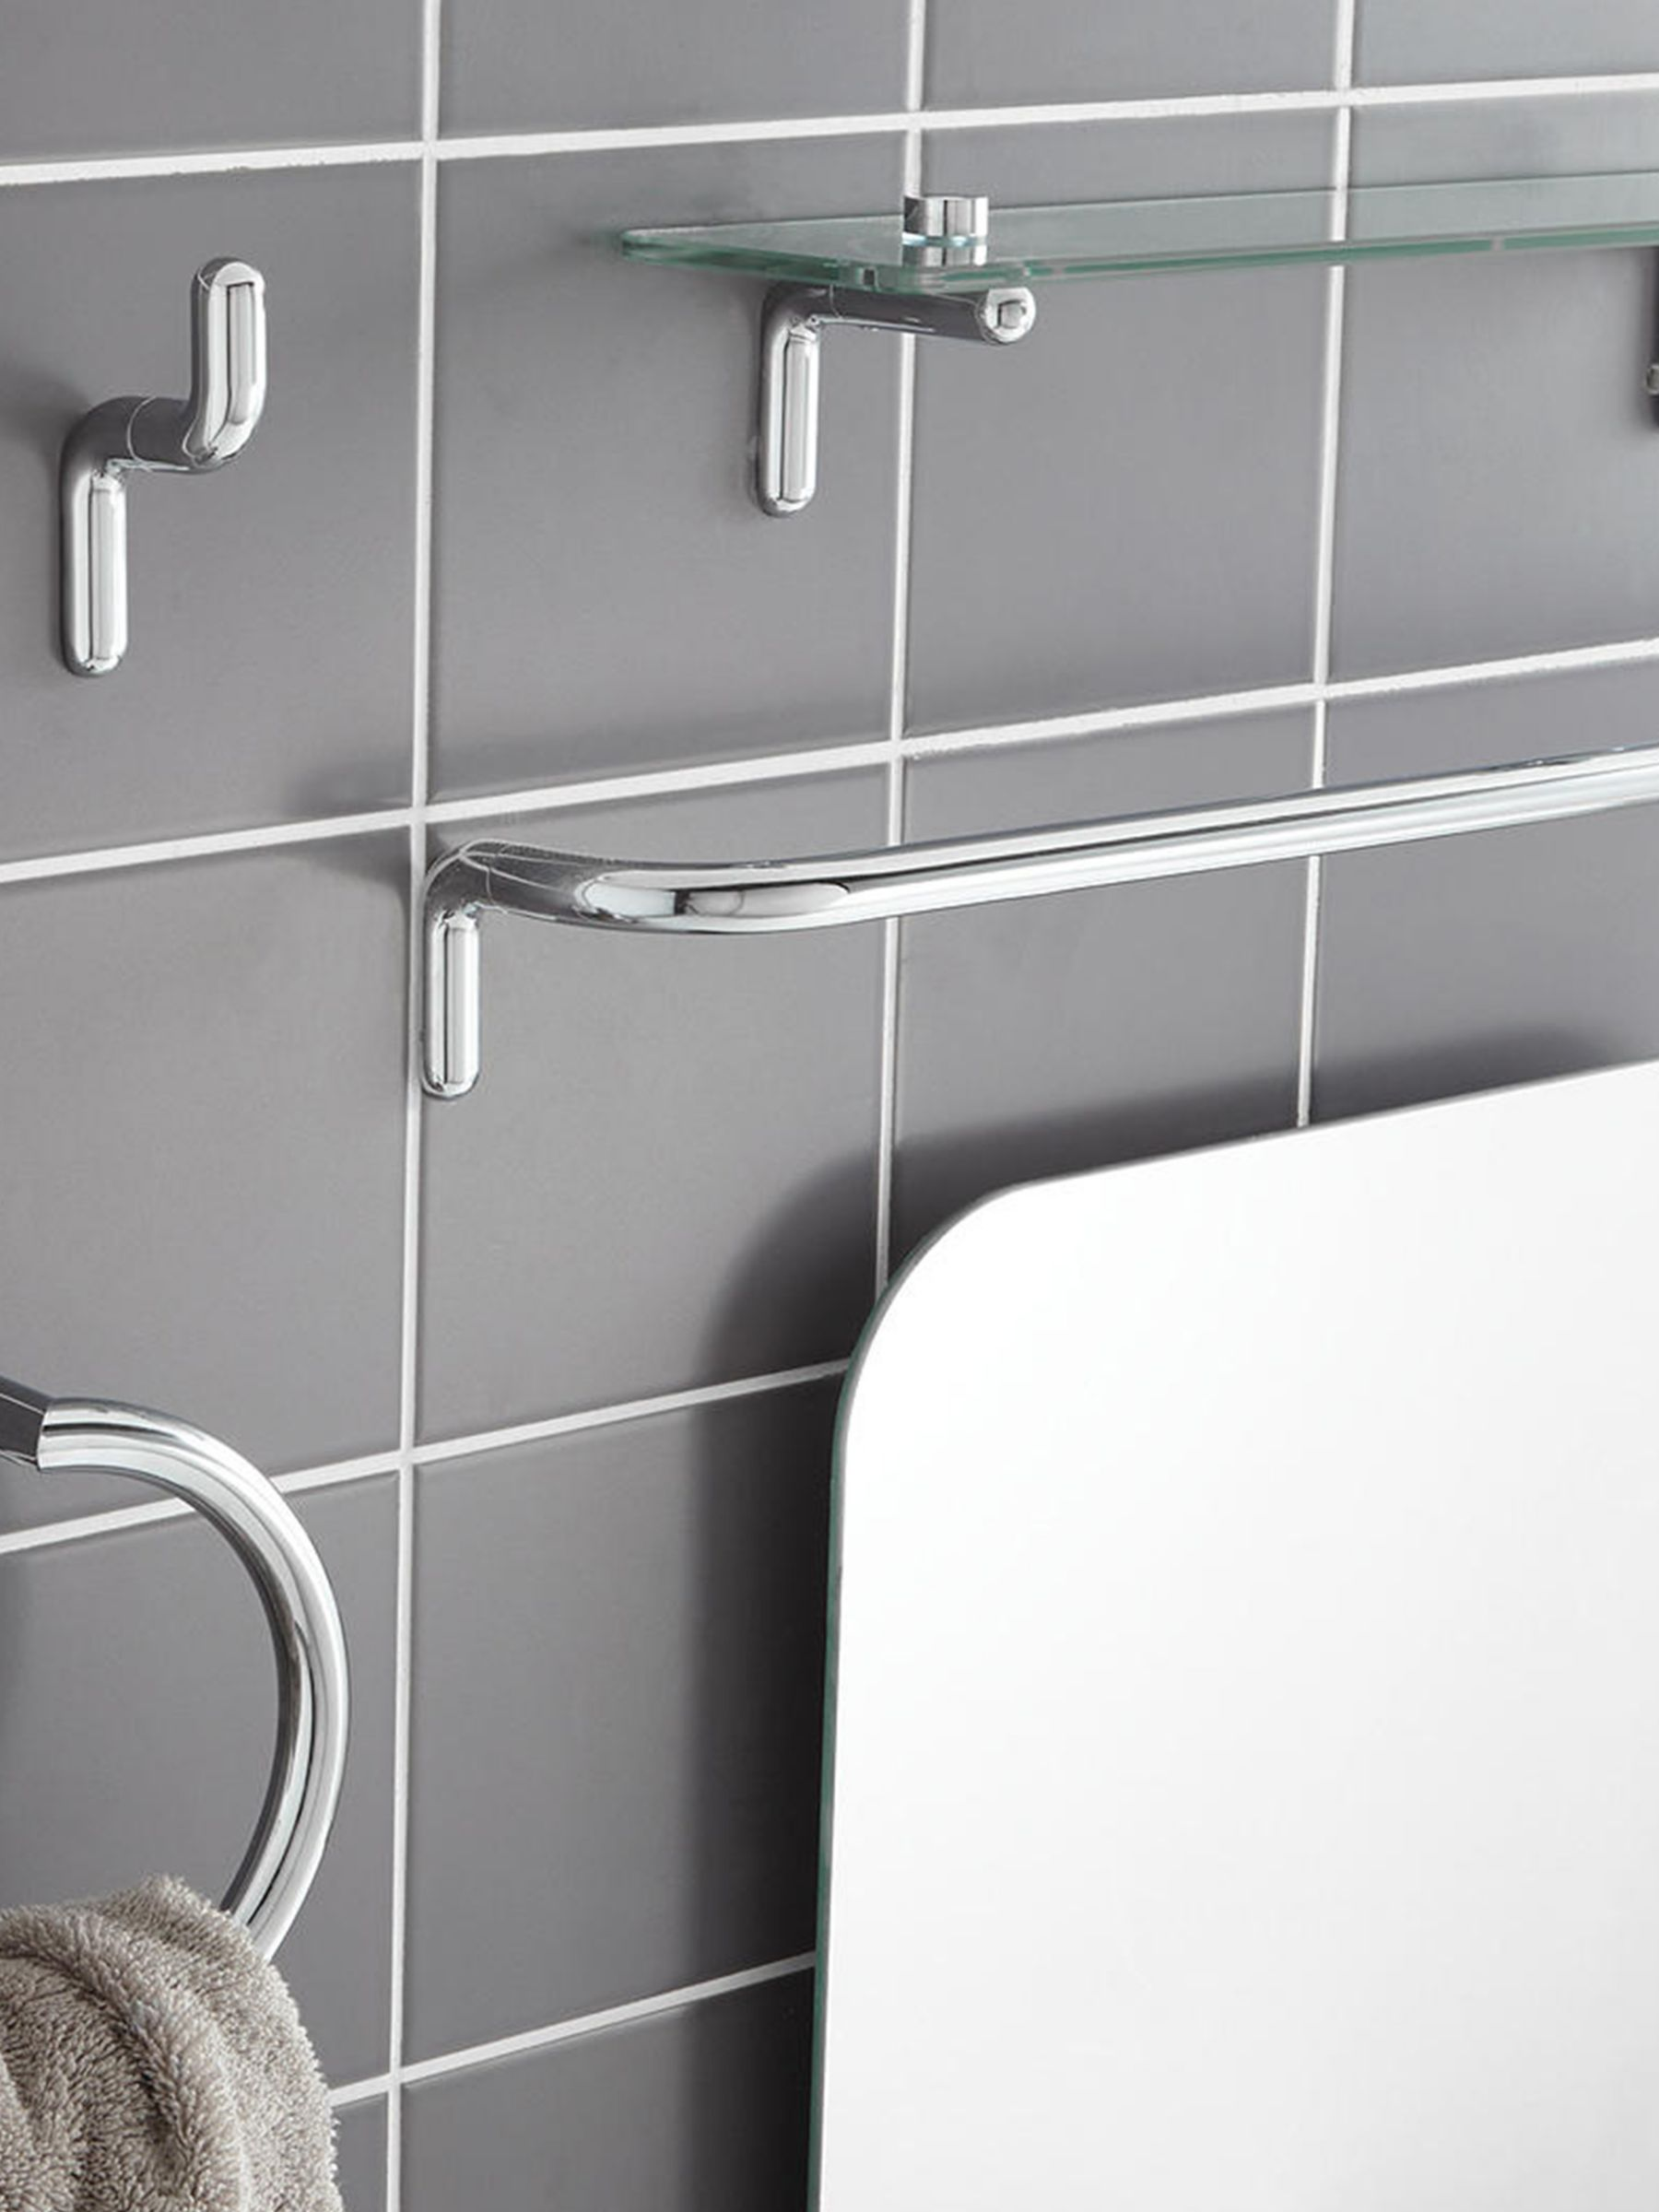 6b4a8e41a794 BATHROOM FITTINGS. BATHROOM FITTINGS. Bathroom Cabinets